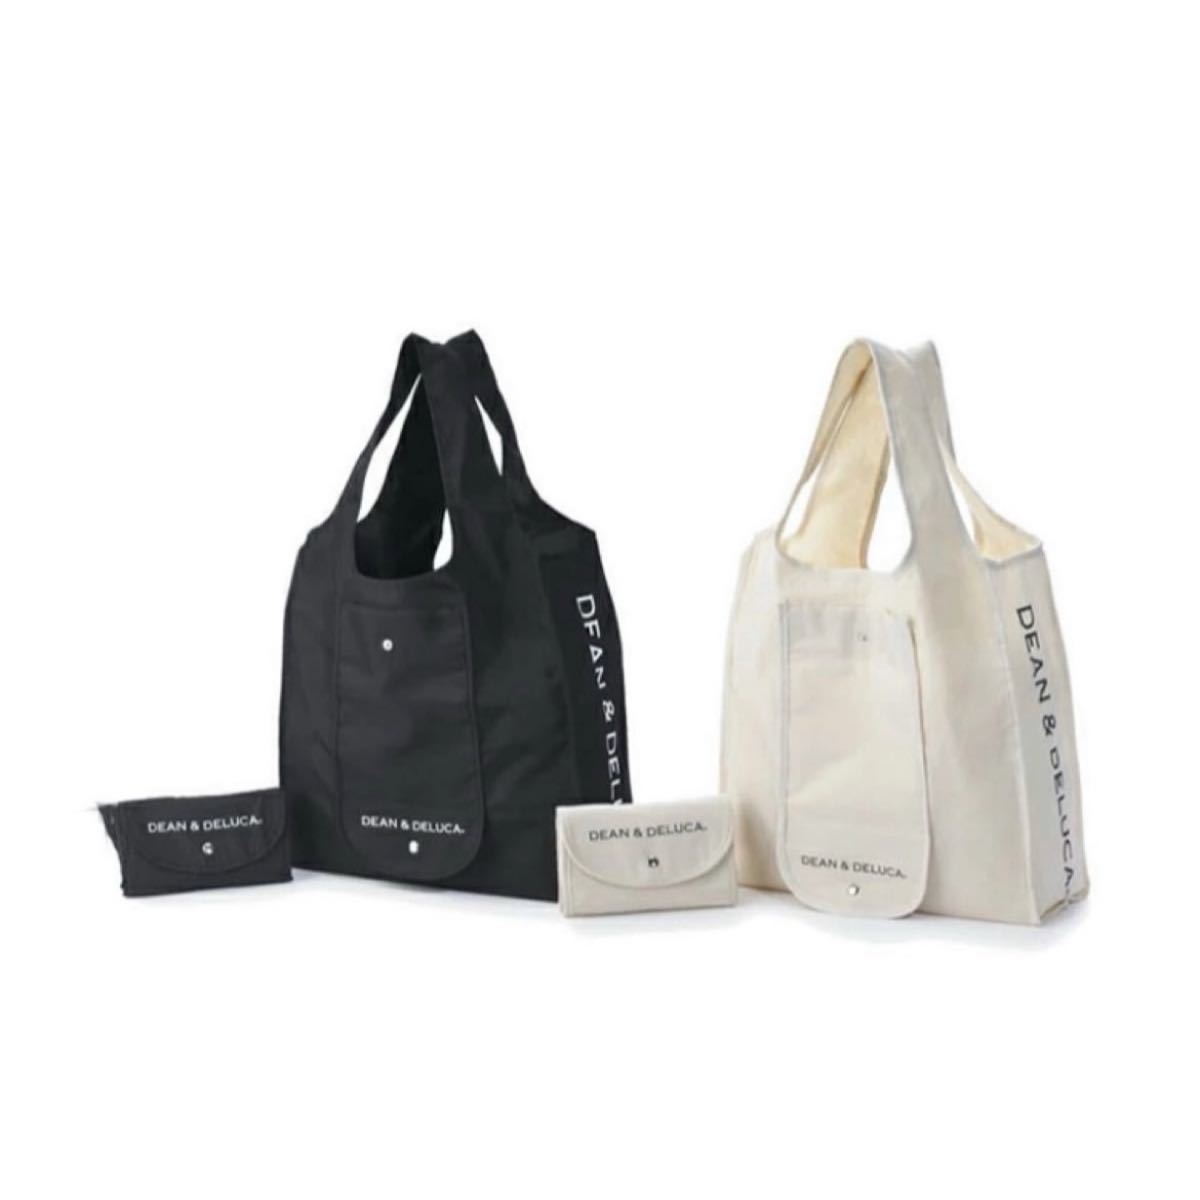 DEAN&DELUCA ディーンアンドデルーカ ショッピングバッグ エコバッグ ブラック ナチュラル 2コセット